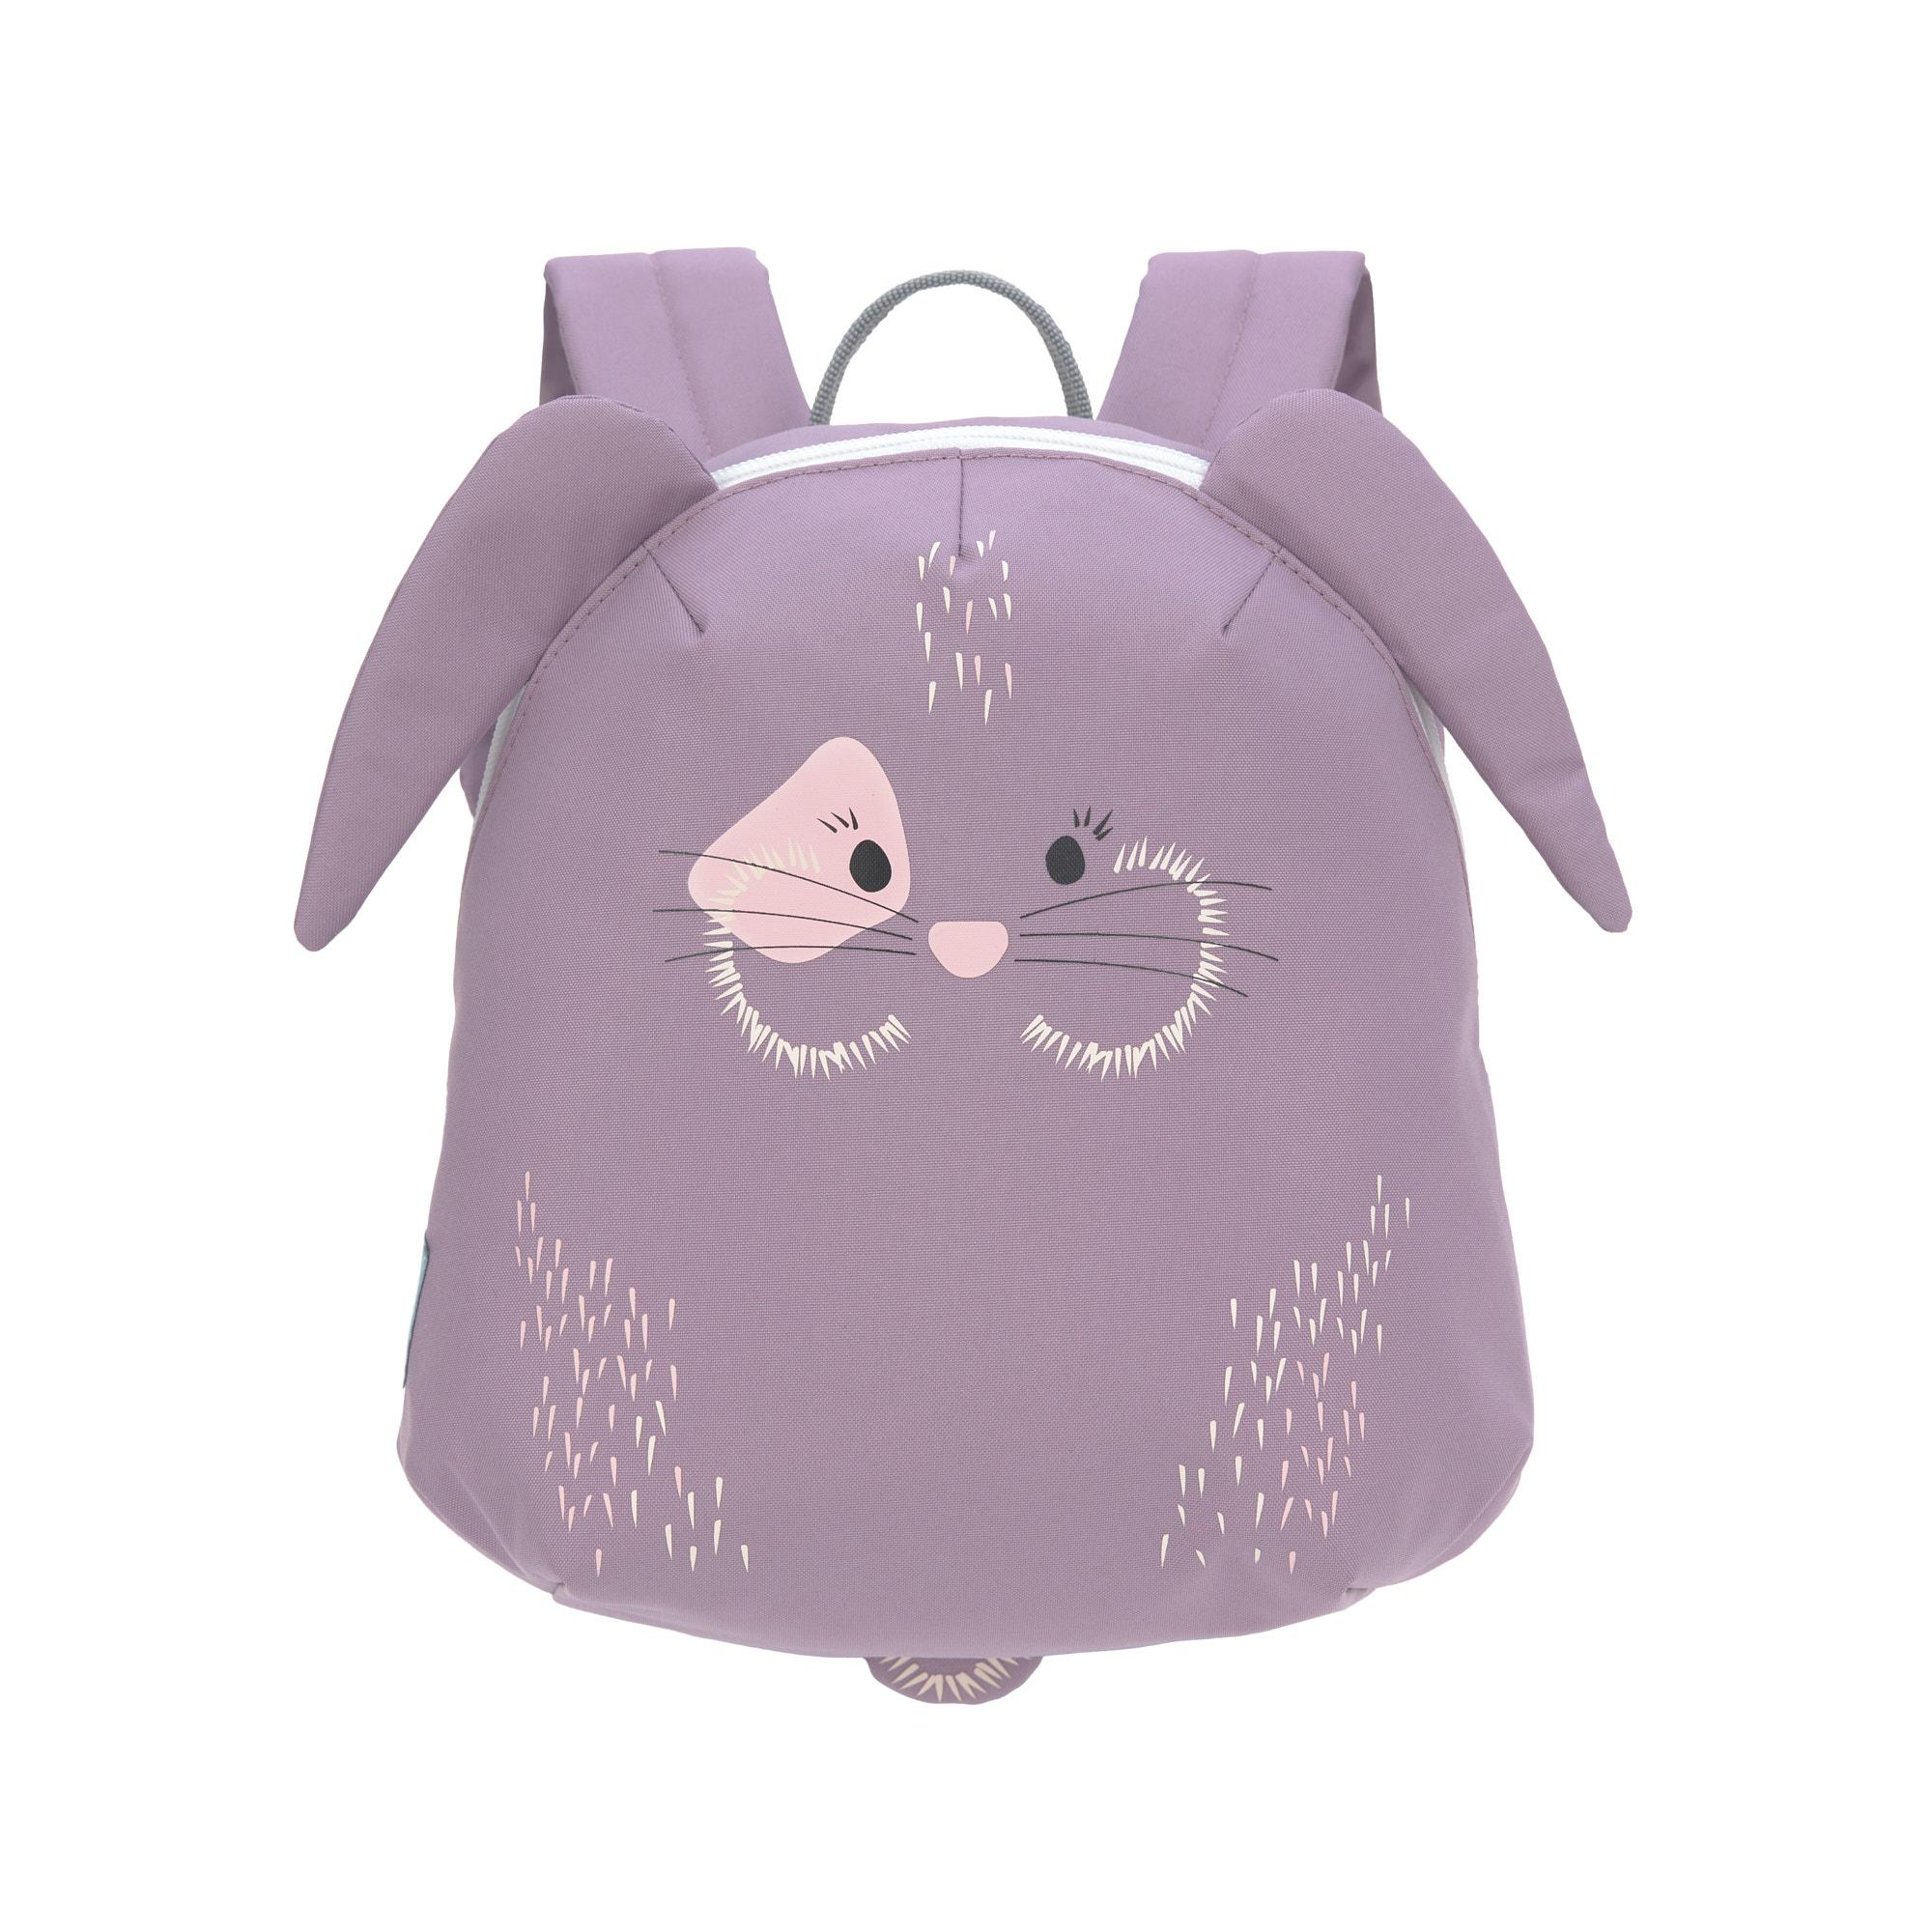 Kindergartenrucksack Hase - Tiny Backpack, About Friends Bunny - Lässig